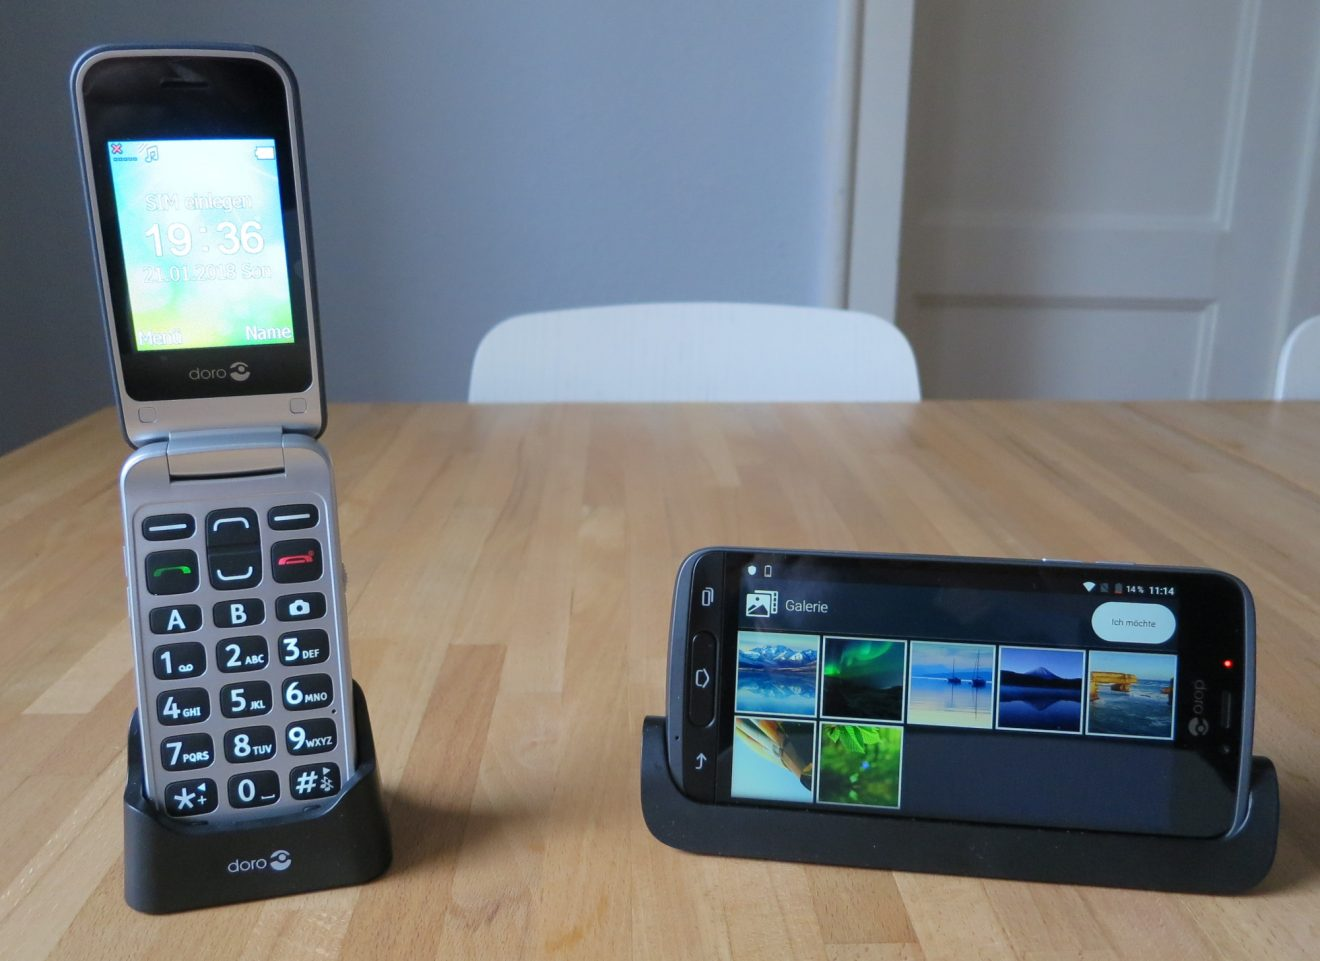 Seniorenhandy Doro 2424 und Senioren-Smartphone Doro 8040 (Bild: Peter Giesecke)